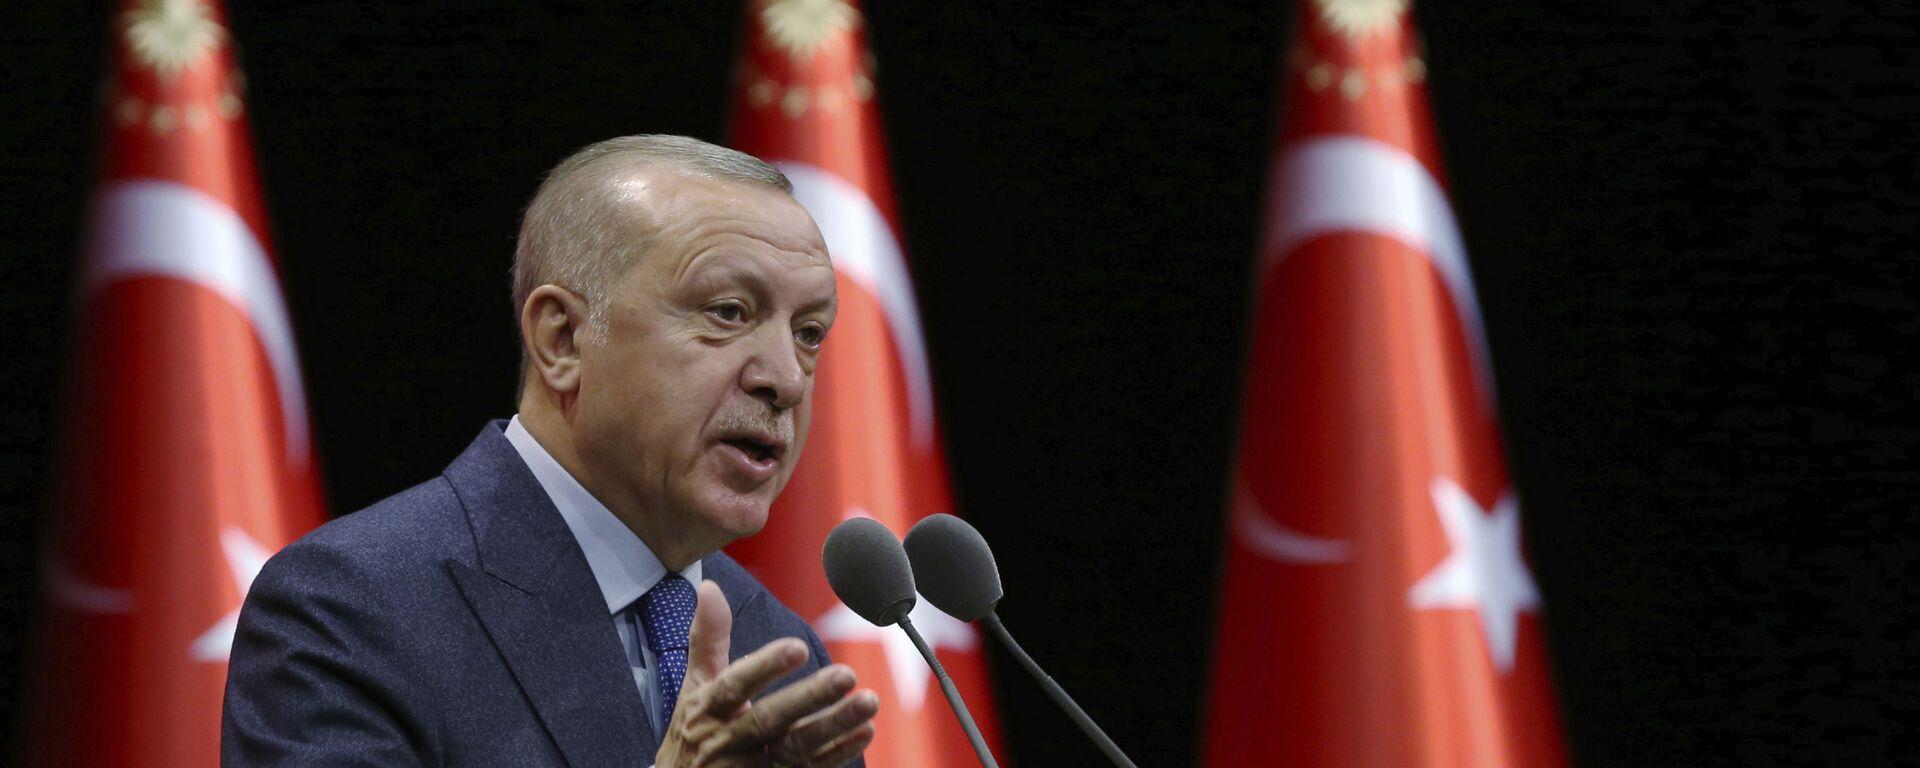 Turecký prezident Recep Tayyip Erdogan - Sputnik Česká republika, 1920, 17.06.2021